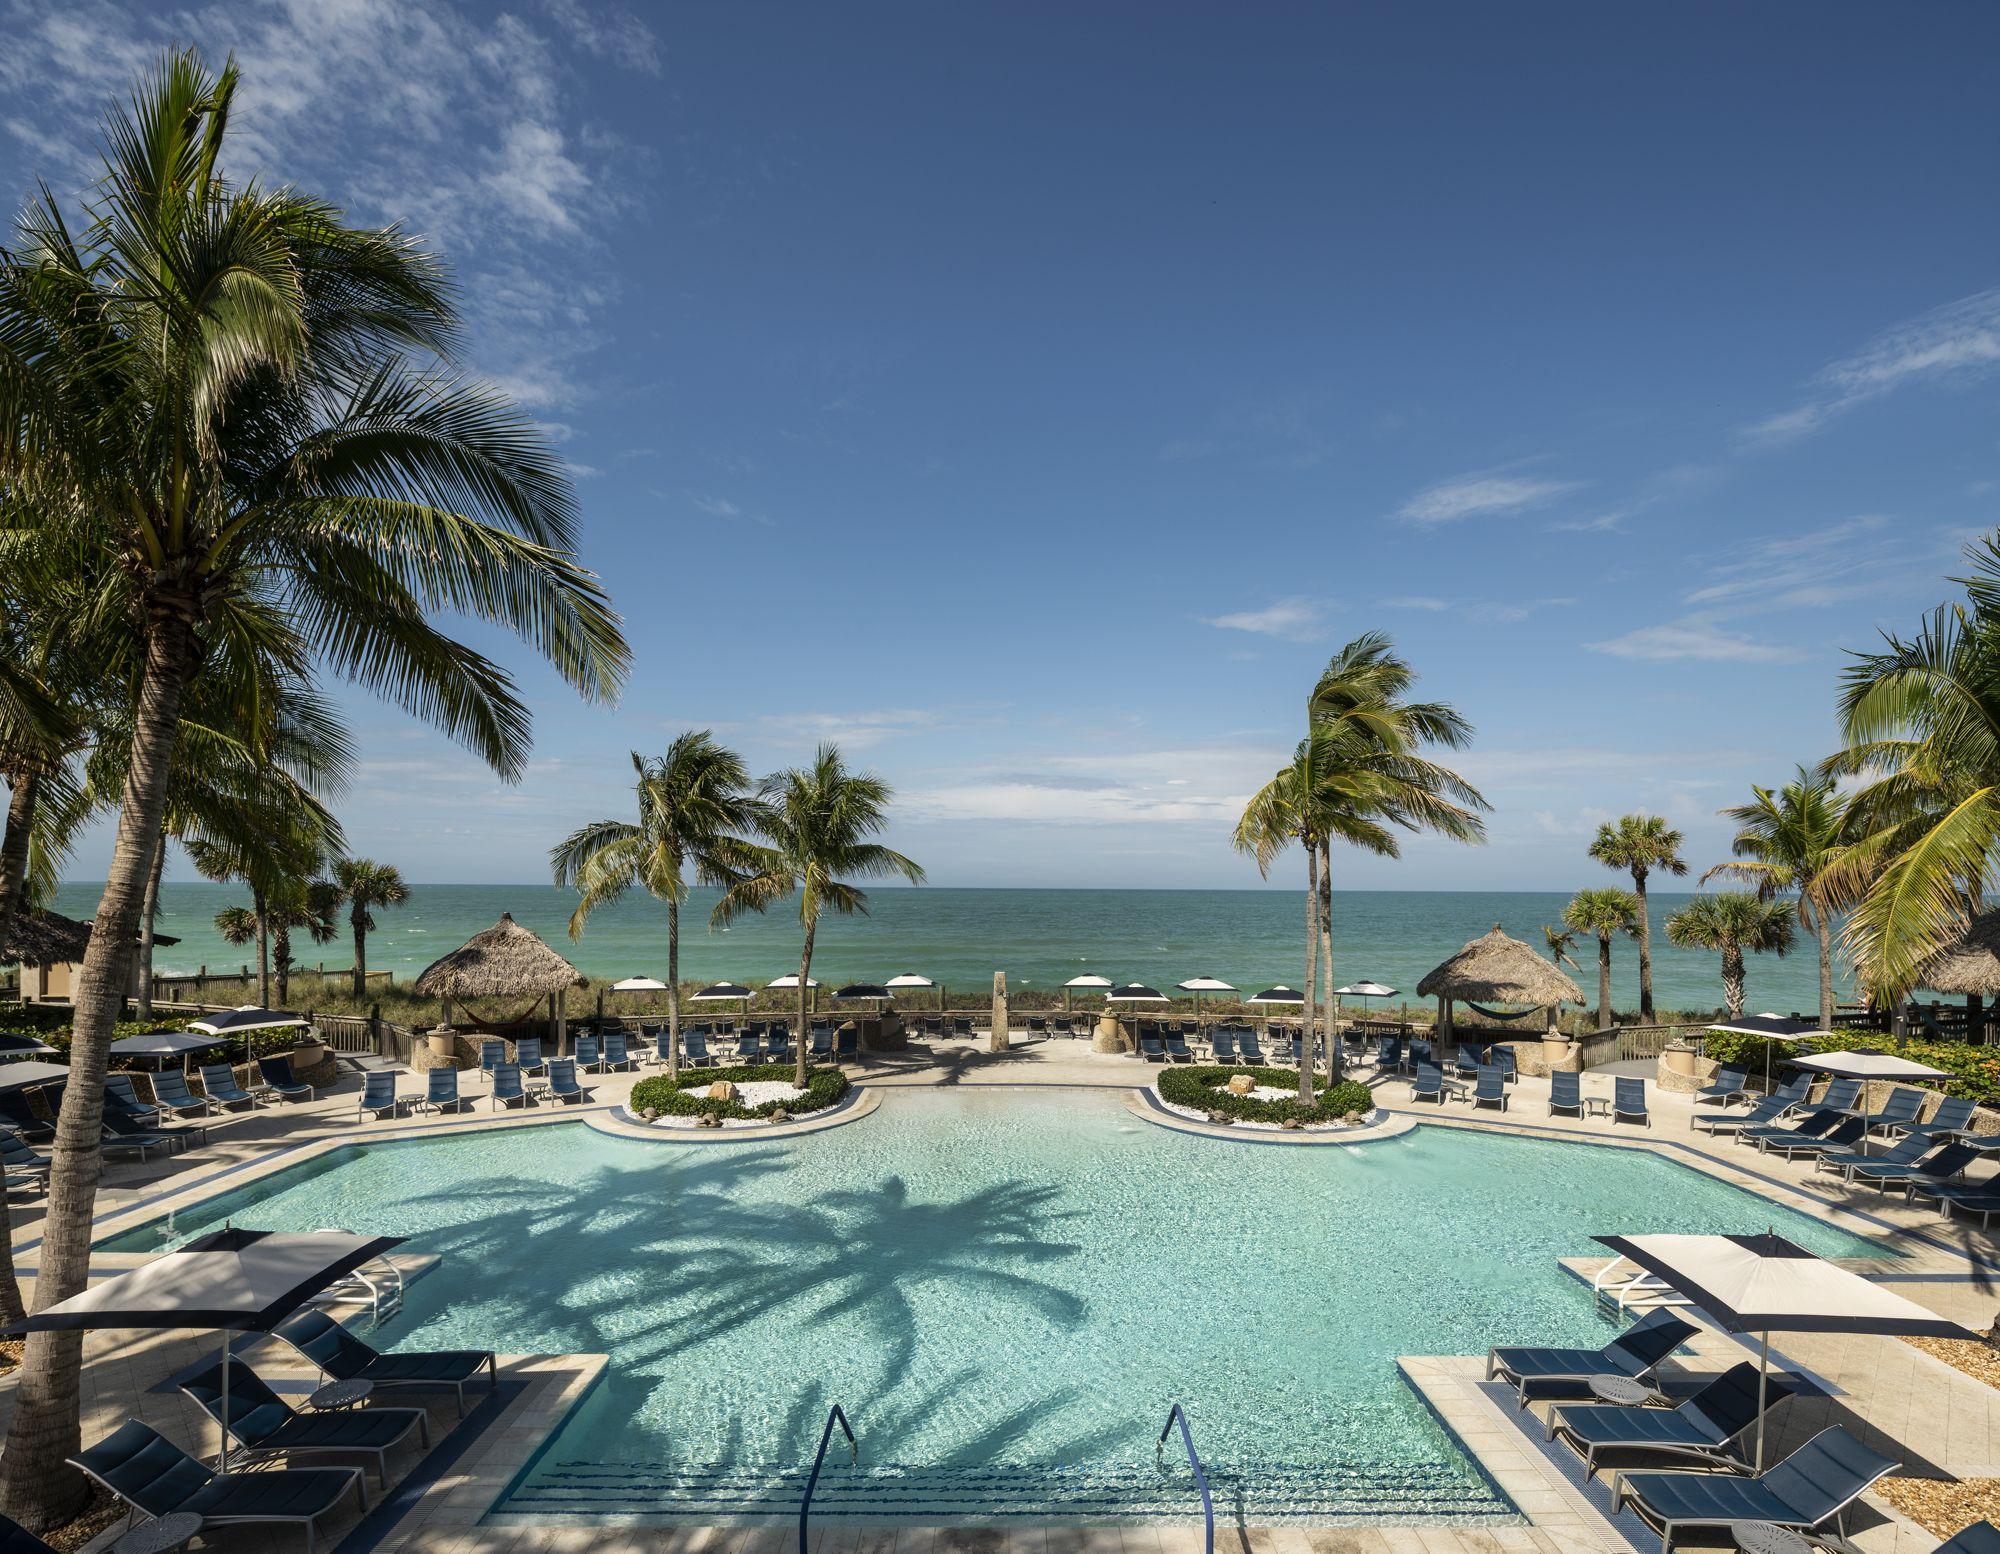 The Ritz Carlton Beach Club The Ritz Carlton Sarasota